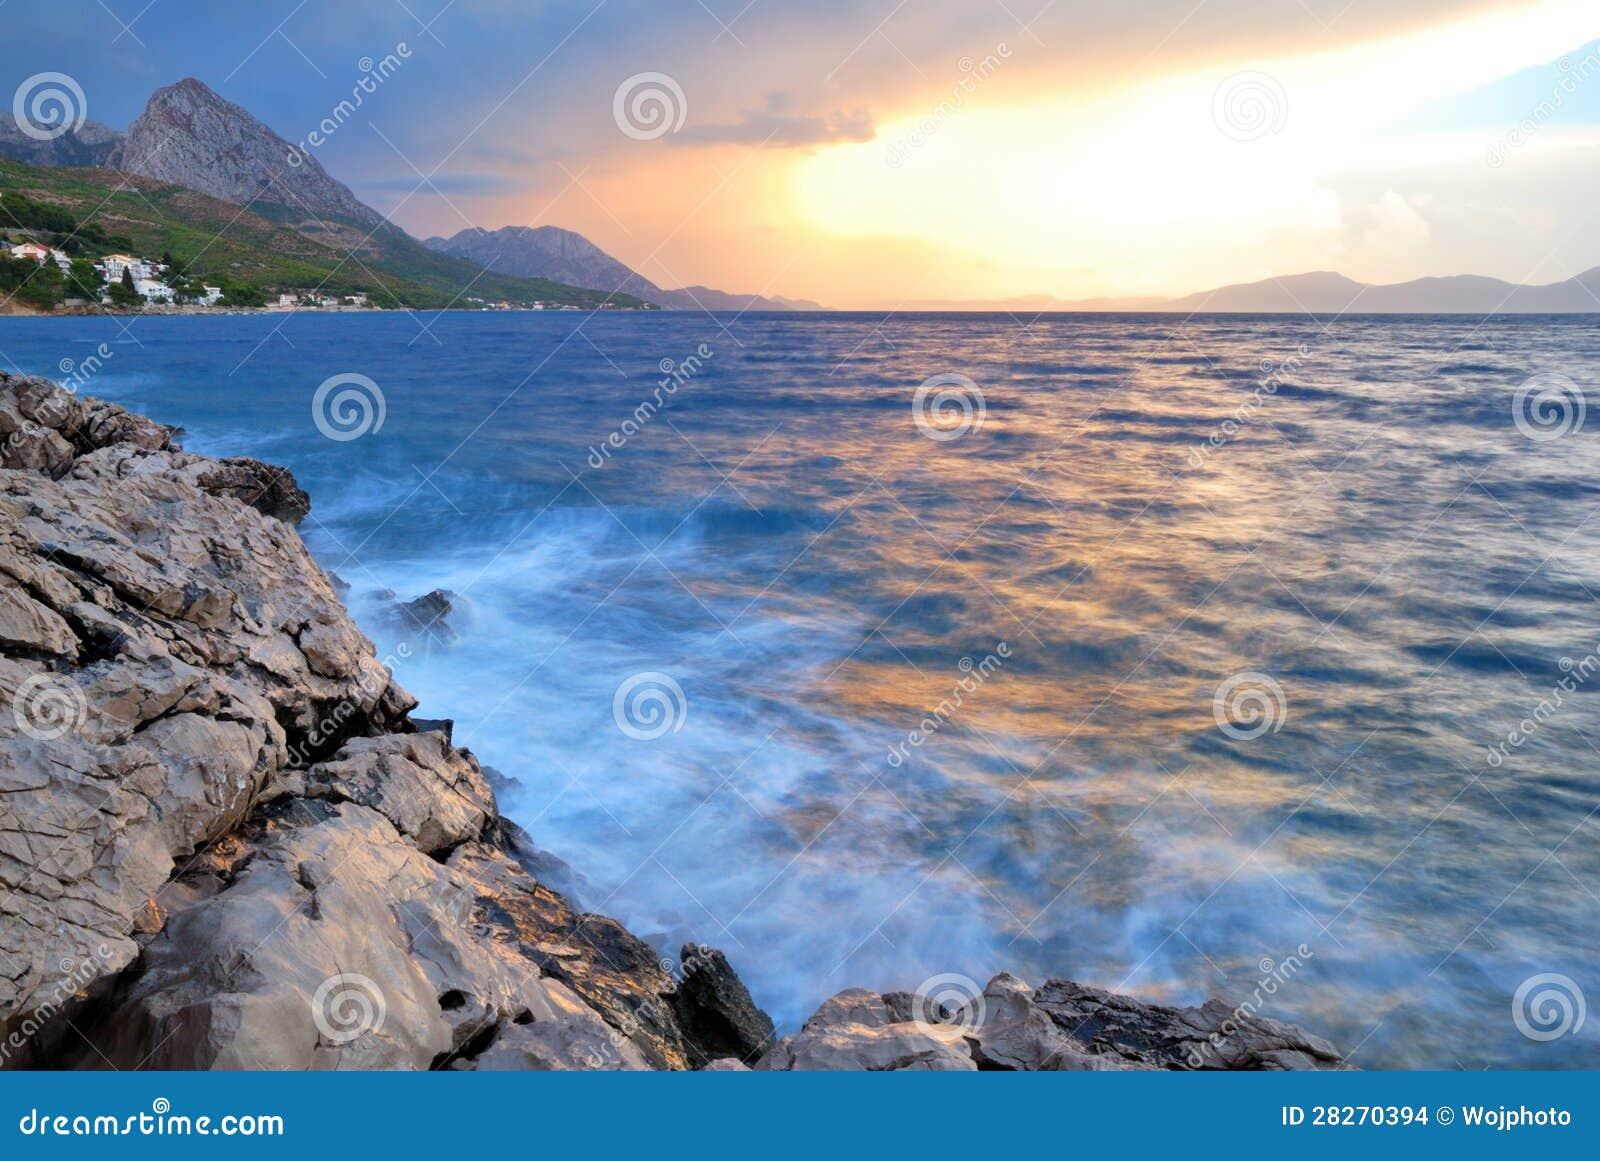 Smooth Evening Sea And Sky Stock Photo. Image Of Croatia